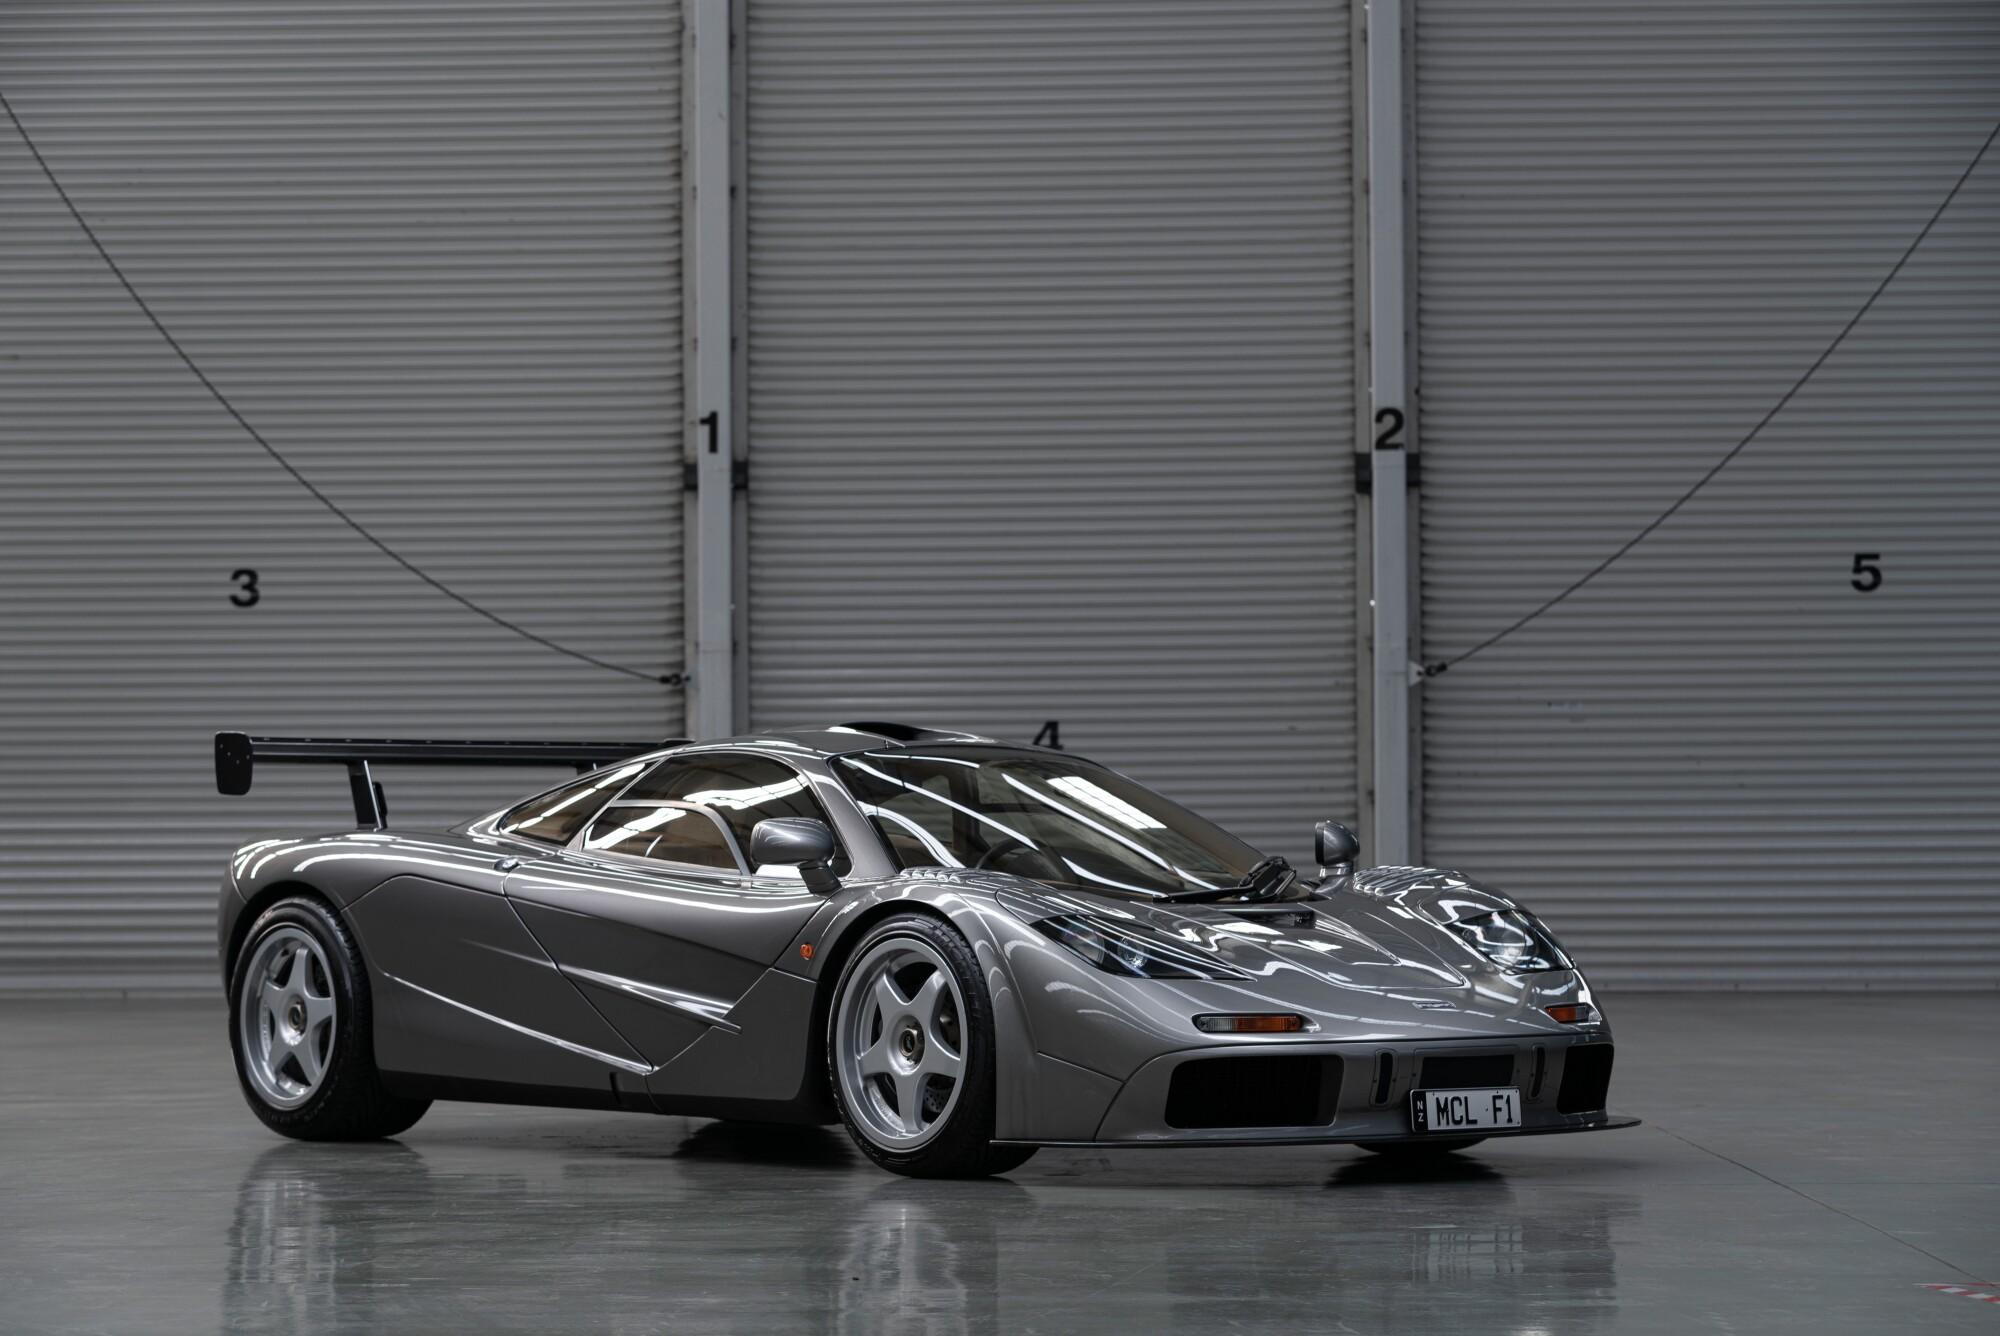 1994-McLaren-F1--LM-Specification-7.jpg